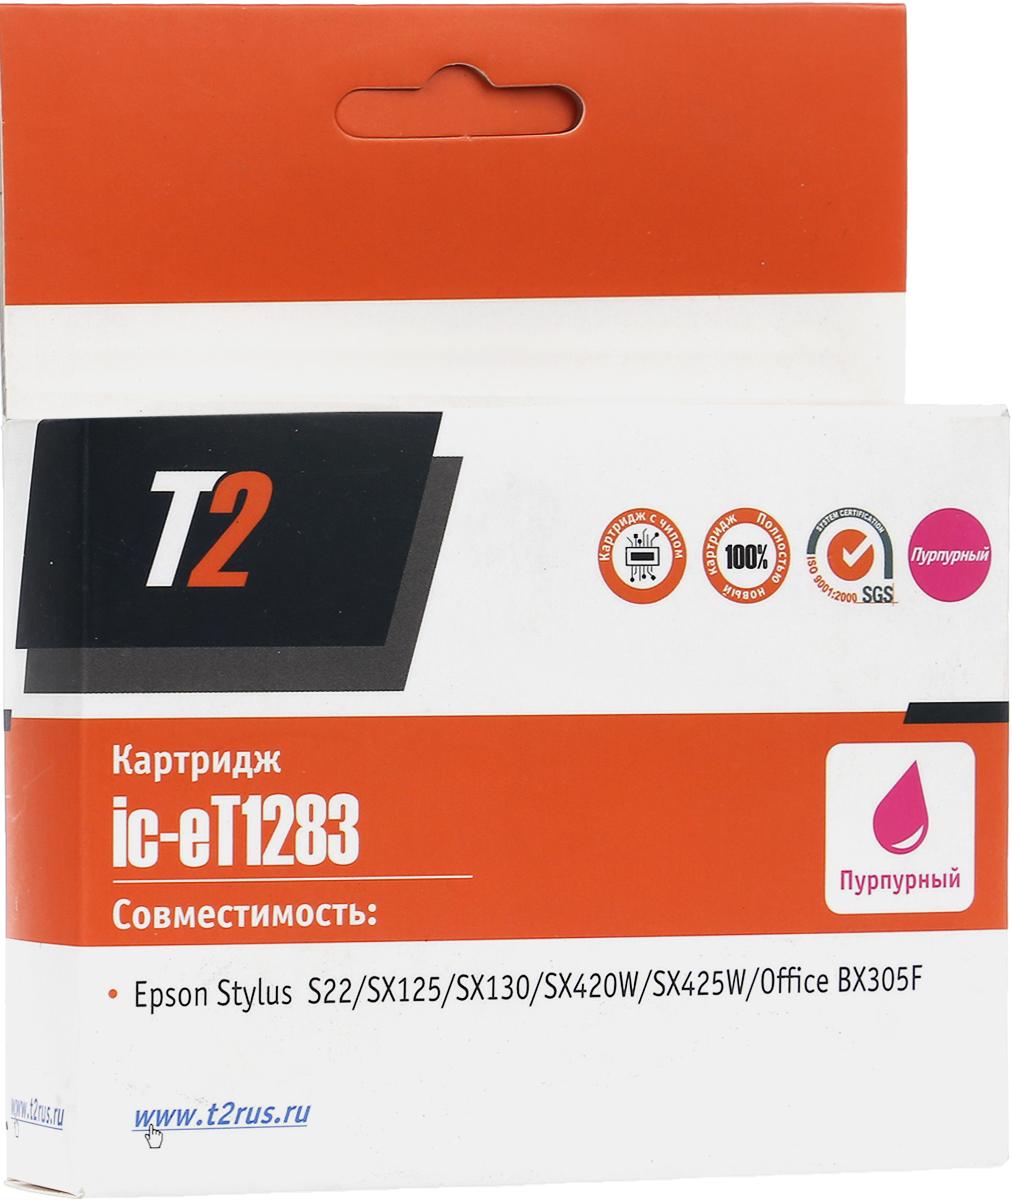 T2 IC-ET1283 (аналог T12834010), Magenta картридж для Epson Stylus S22/SX125/SX130/SX420W/SX425W/Office BX305F картридж profiline pl 1281 black для epson styluss22 sx125 sx130 sx420w sx425w office bx305f bx305fw